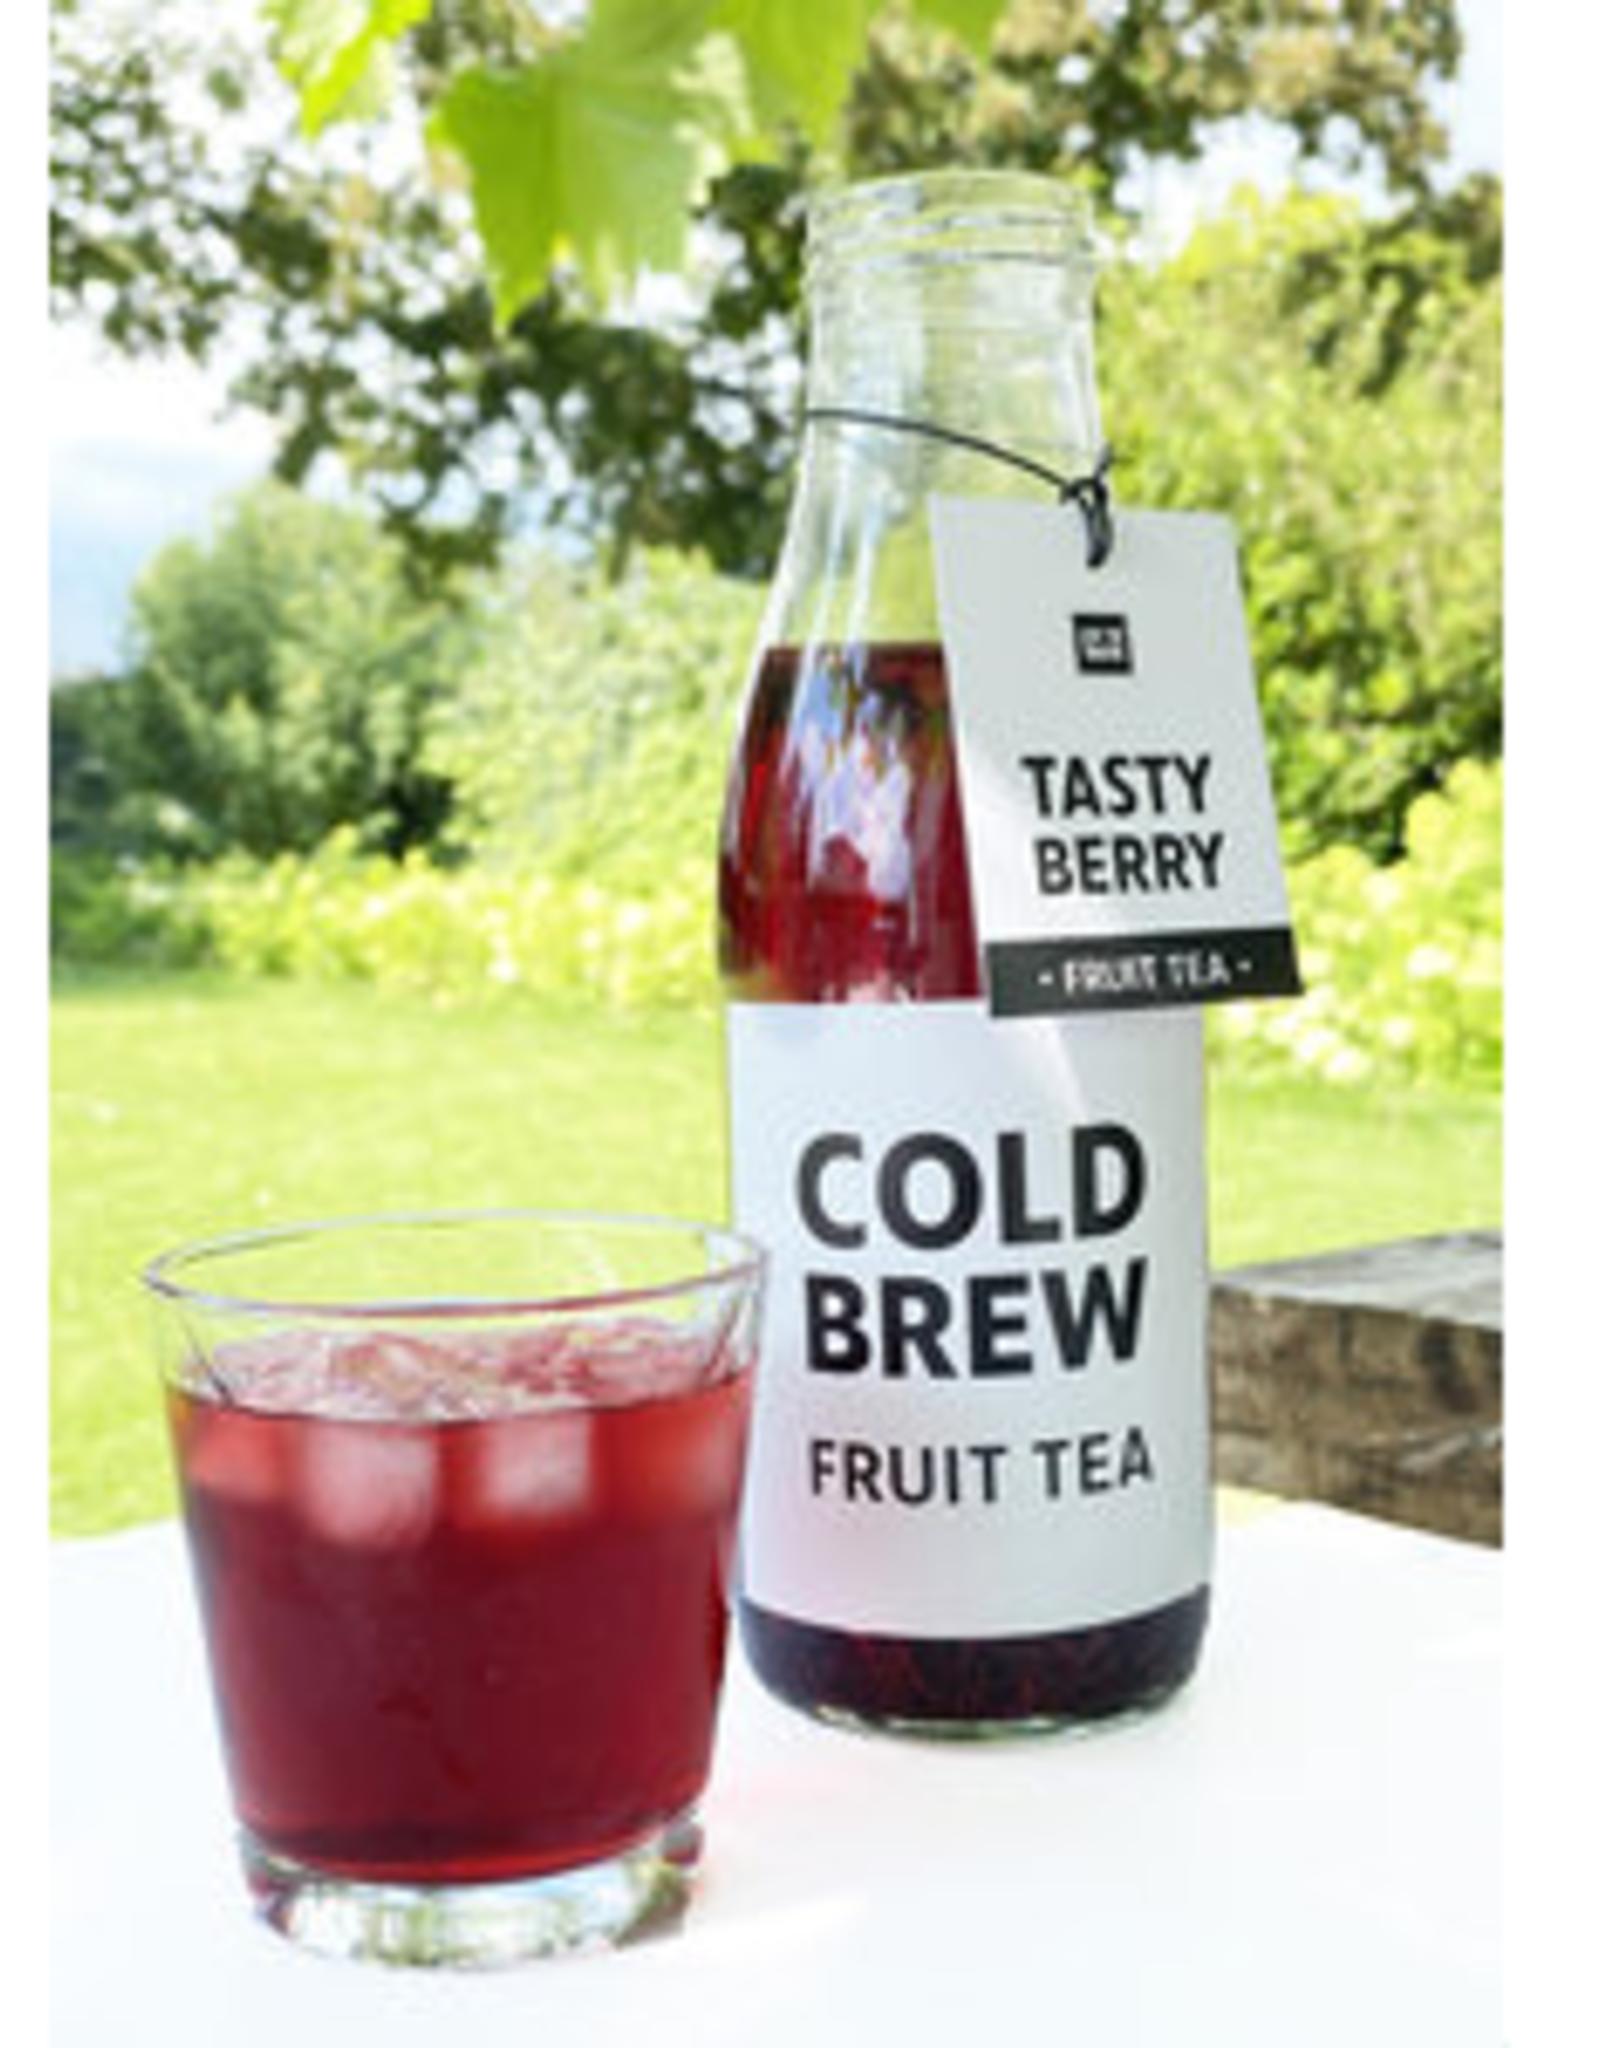 "LIV 'N TASTE Cold Brew Fruit Tea ""Tasty Berry"" - Liv 'n Taste"